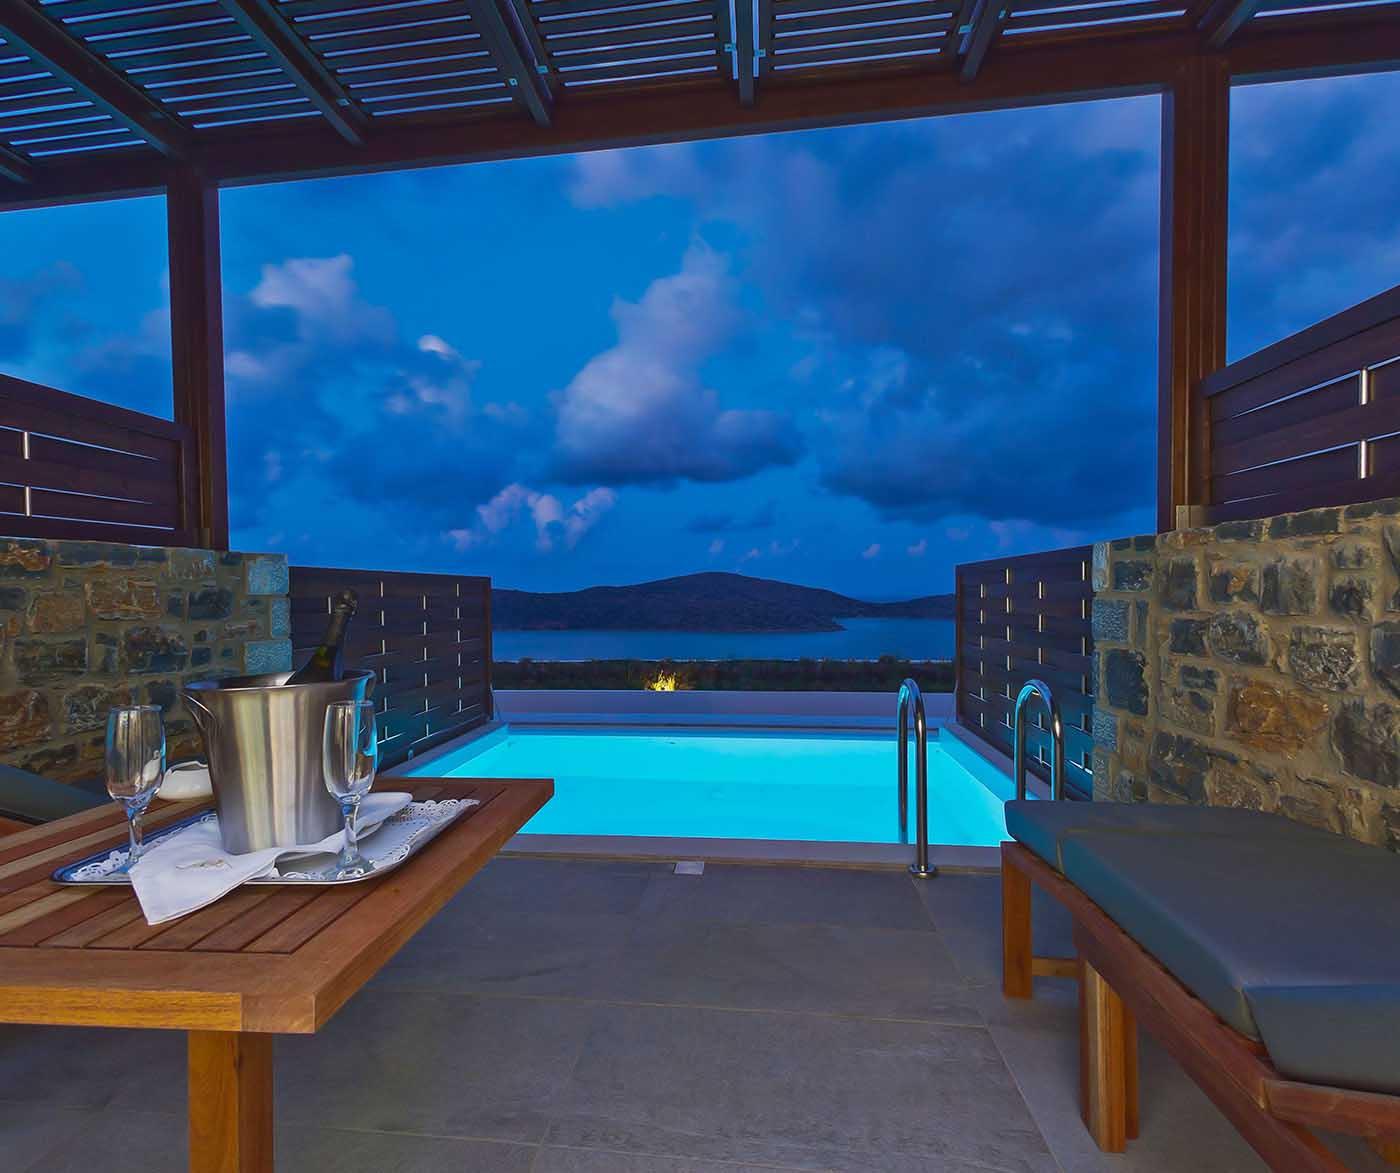 Pella hotels & resorts, 50% discount for early bookings, Pella, Macedonia, Greece, Europe